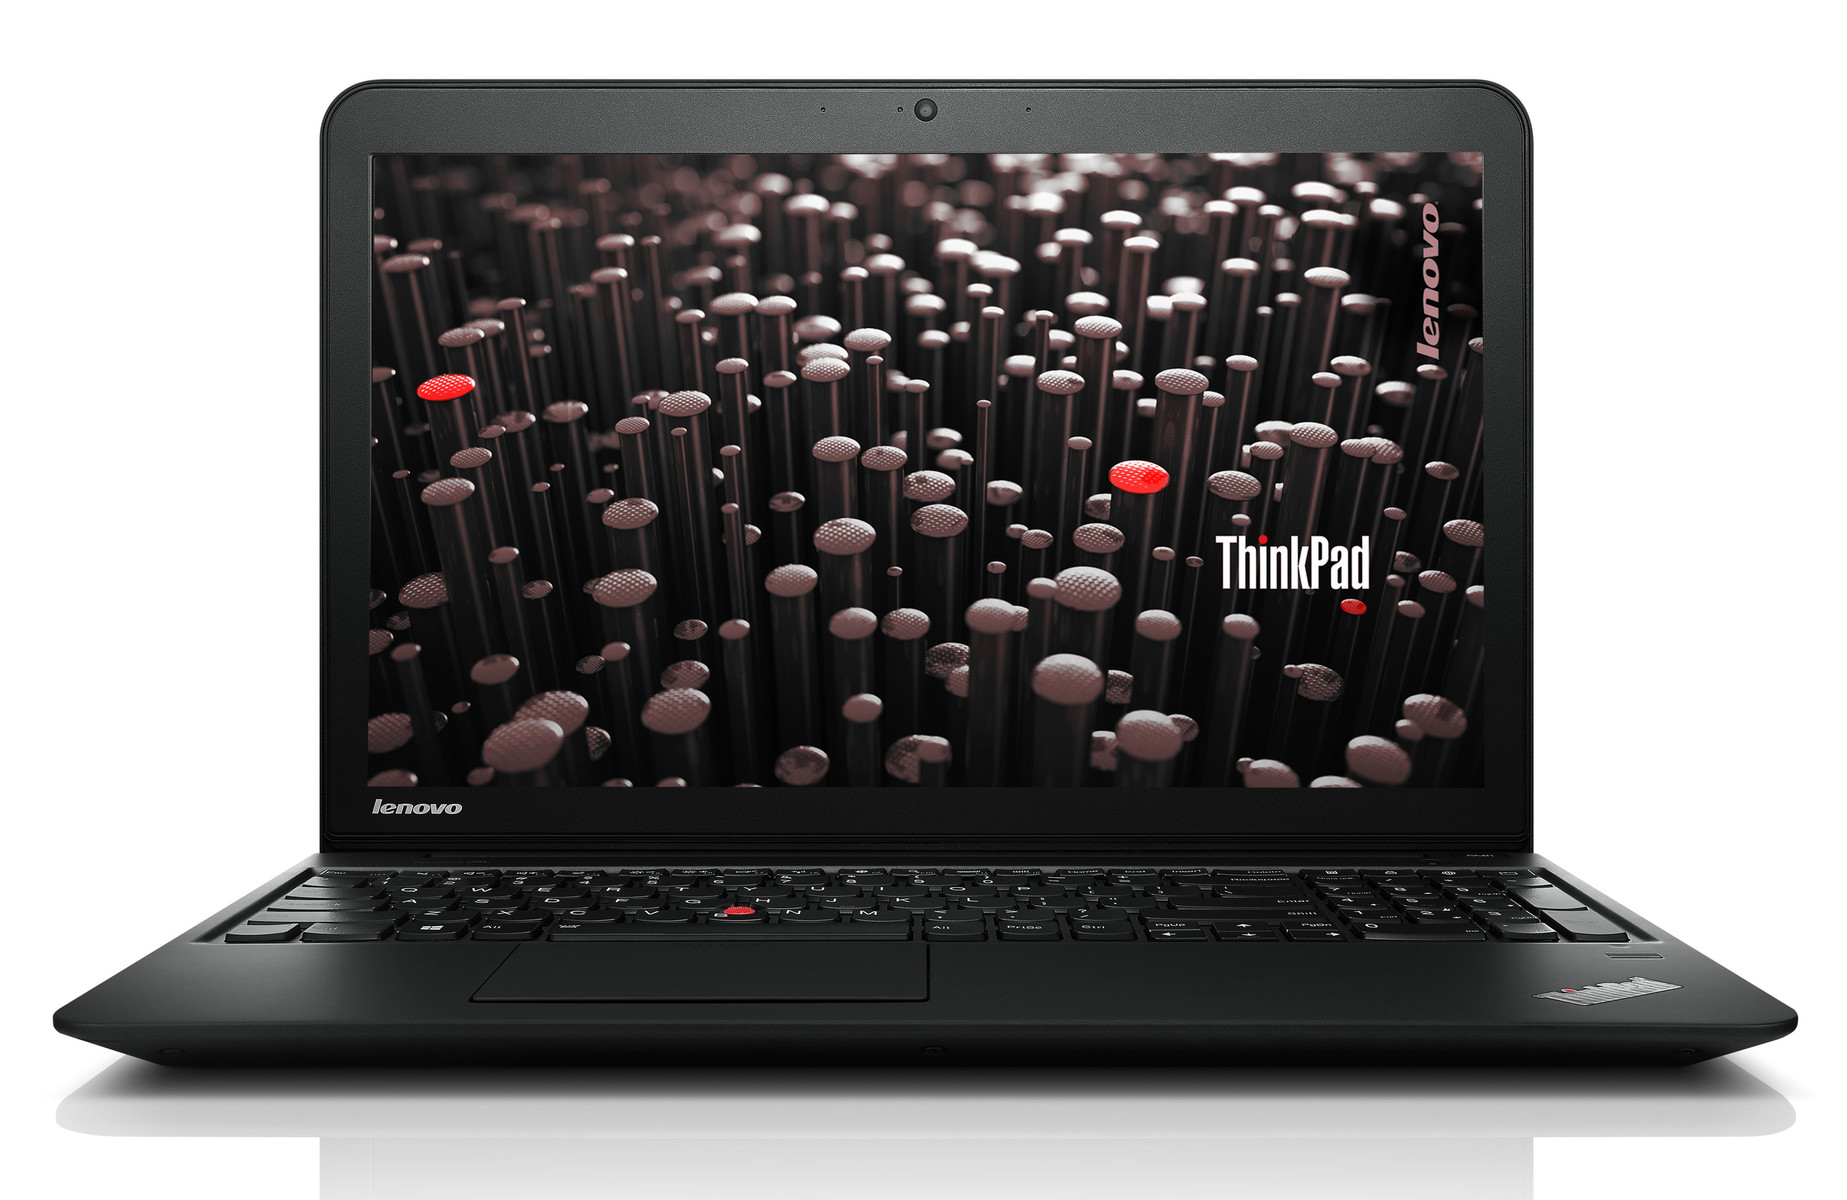 Lenovo ThinkPad S531 AMD/Intel Graphics 64 BIT Driver